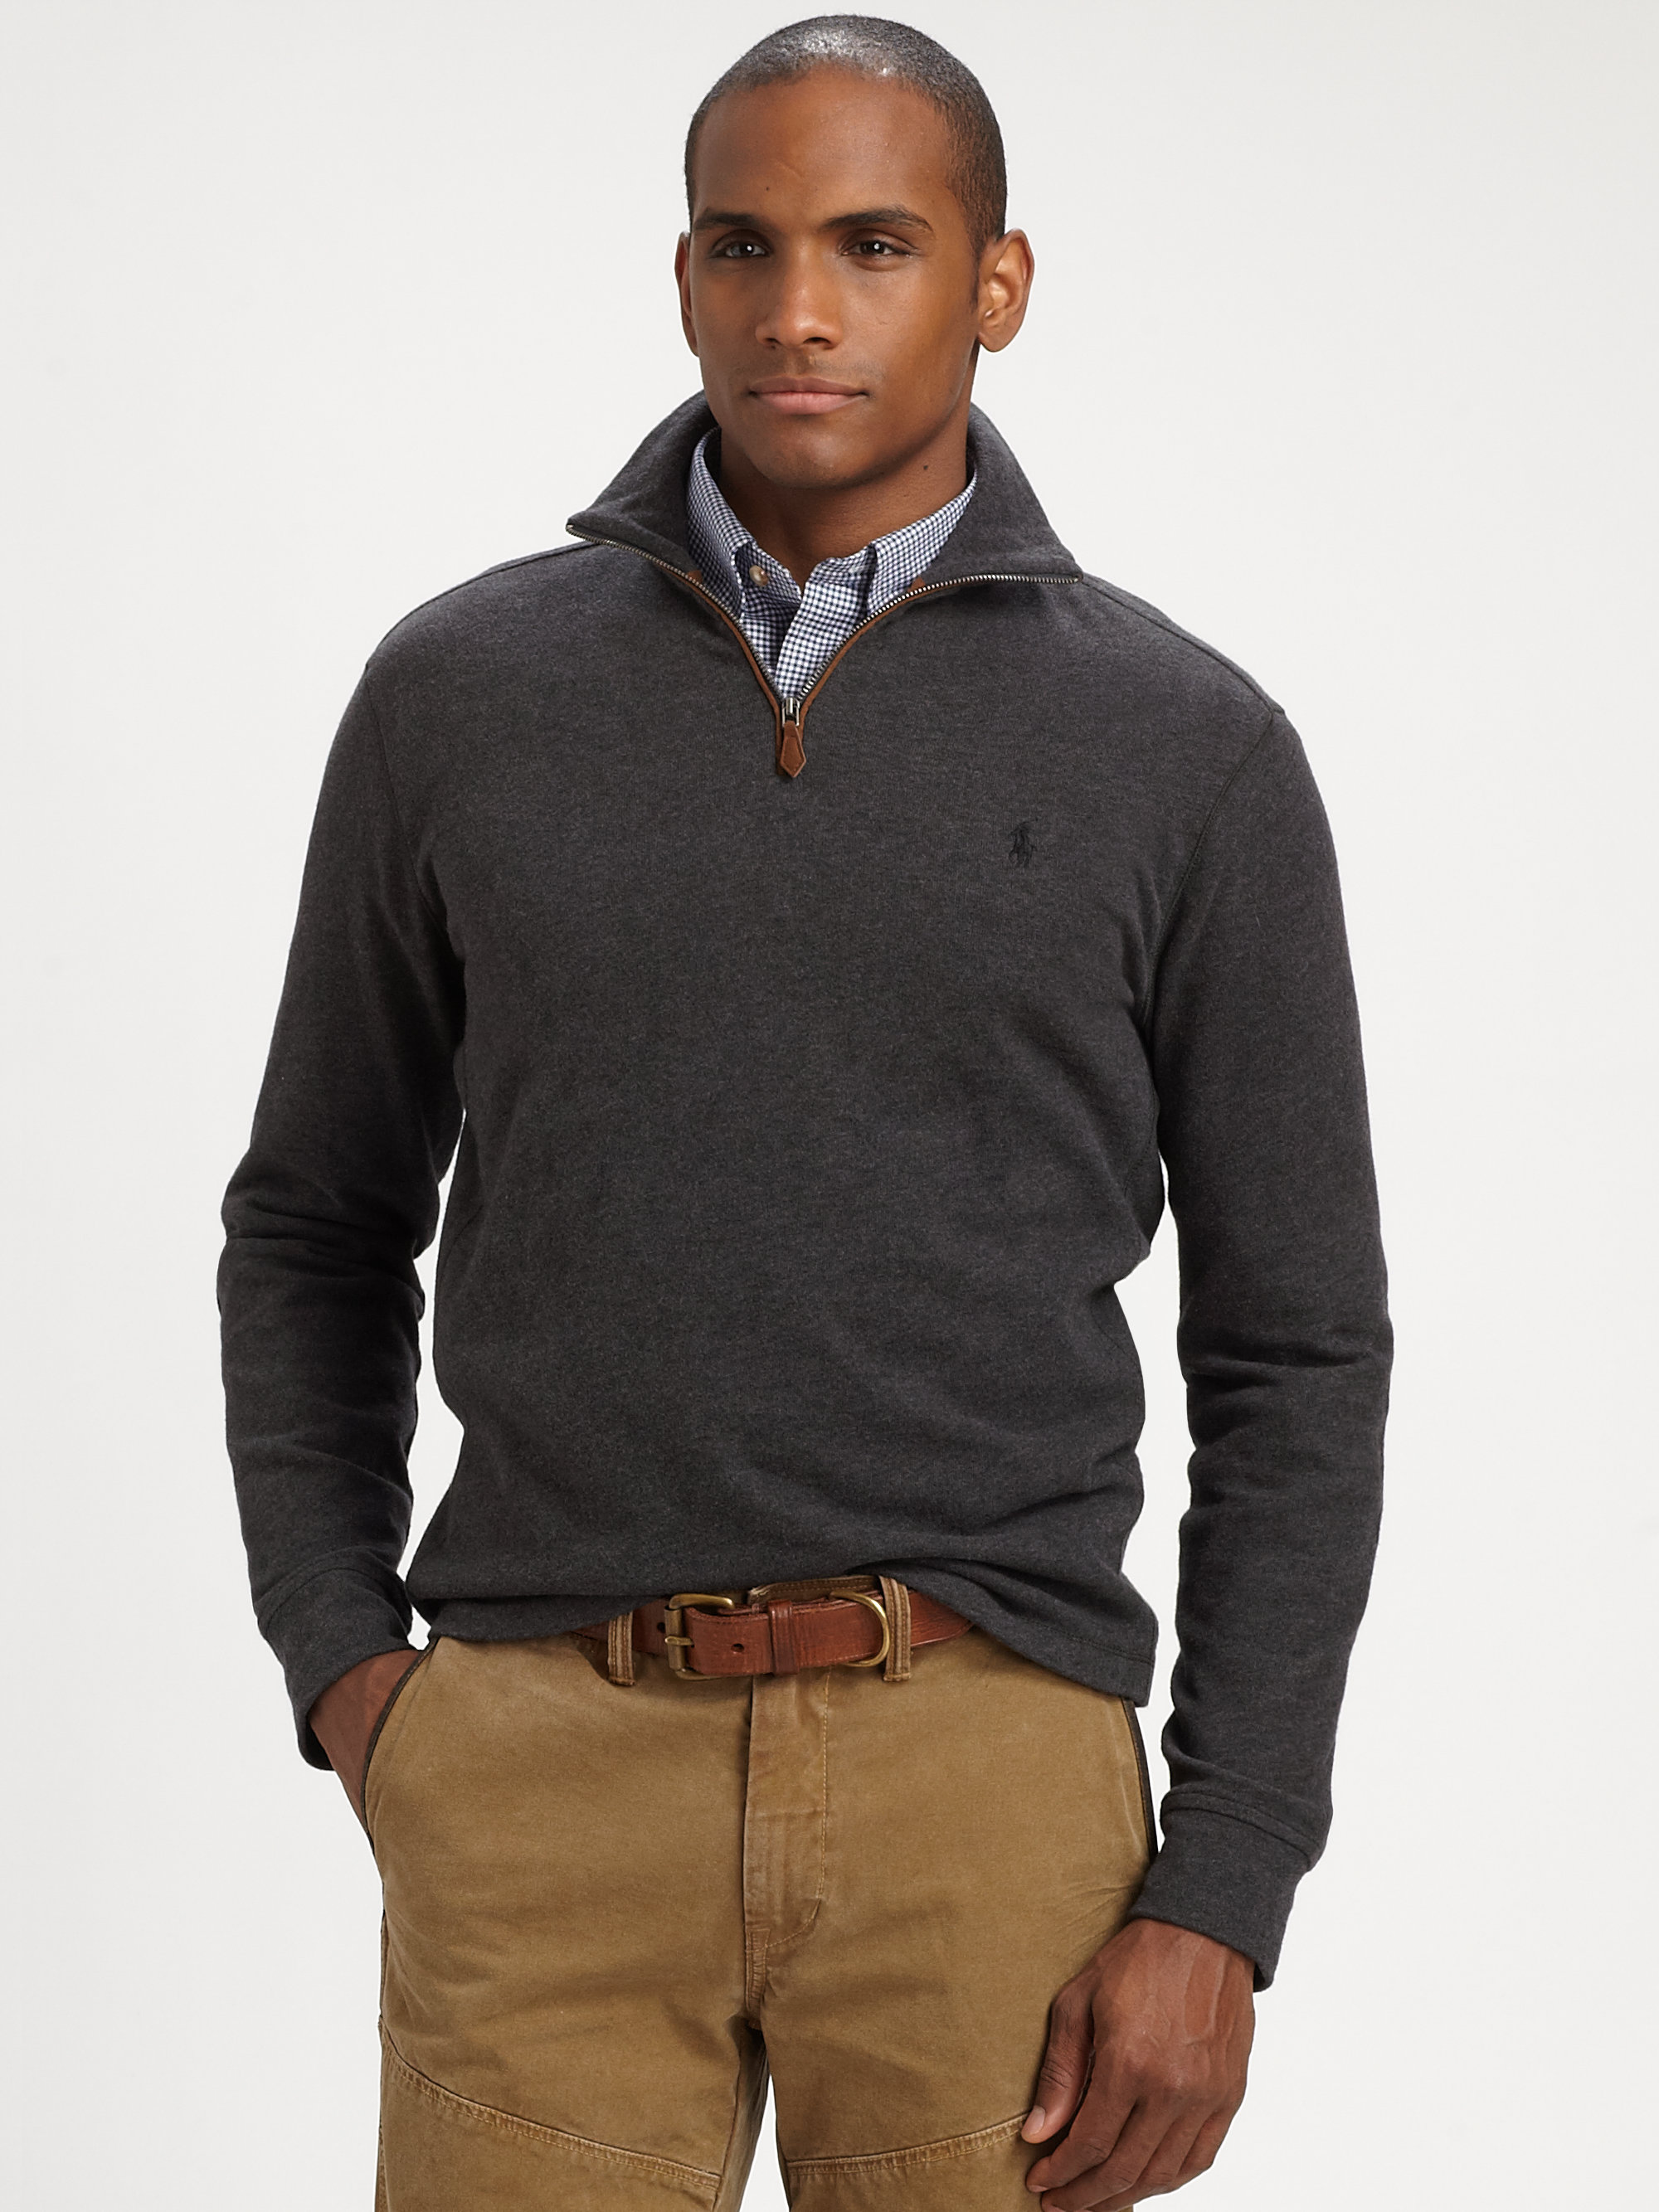 polo ralph lauren sueded jersey halfzip pullover in gray. Black Bedroom Furniture Sets. Home Design Ideas